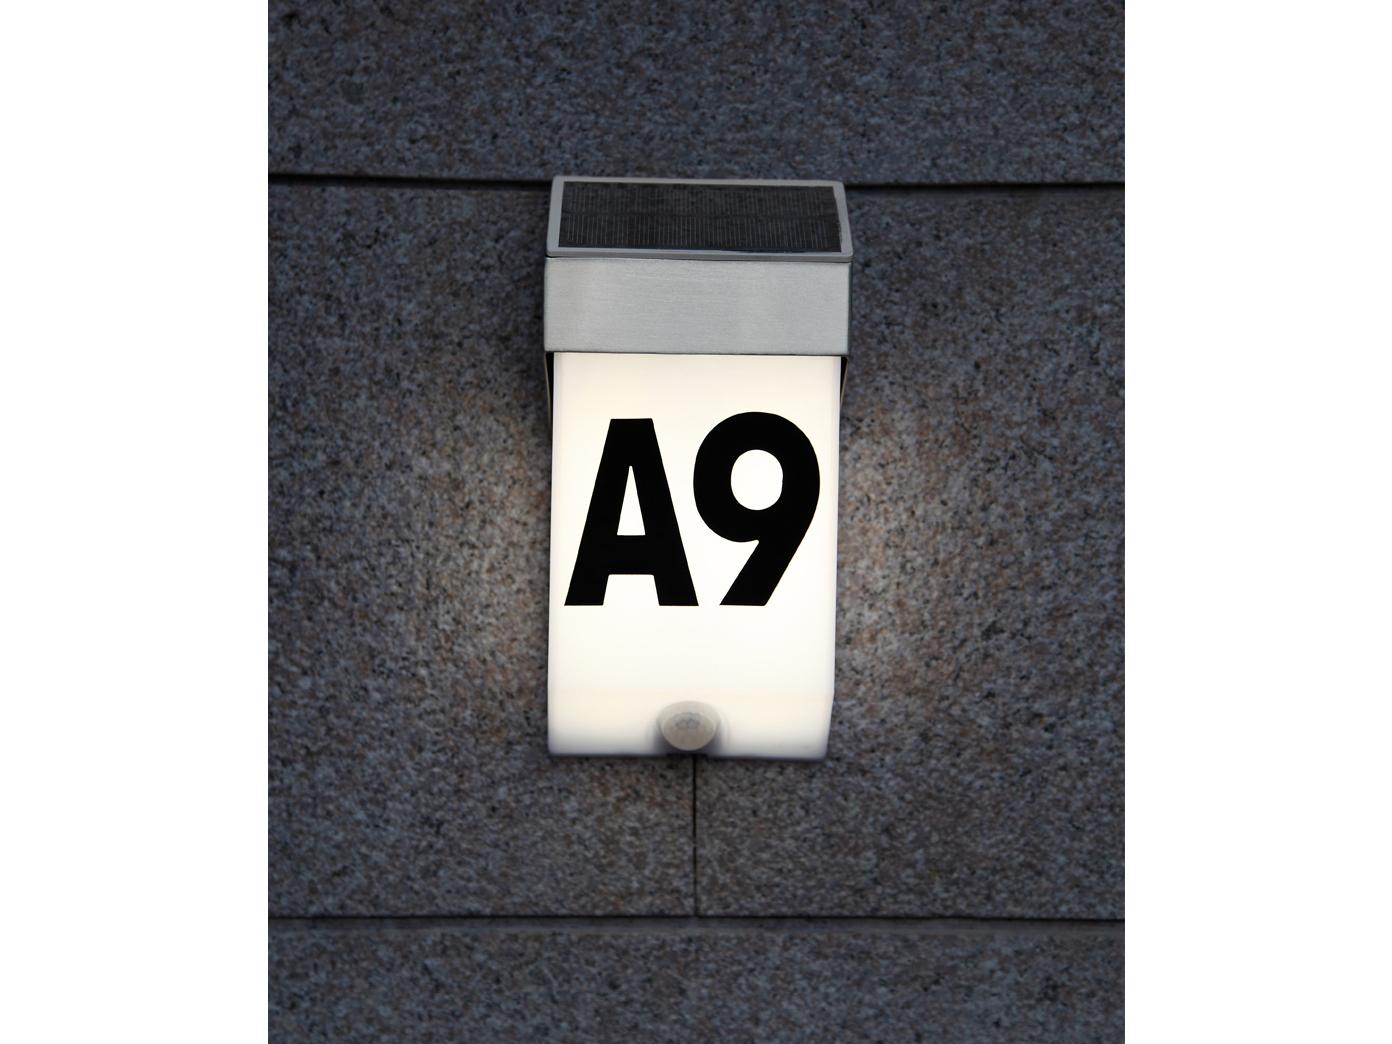 LED-Ausenwandleuchte-mit-Solar-Bewegungsmelder-Hausnummern-IP44-Wandleuchten miniatura 7